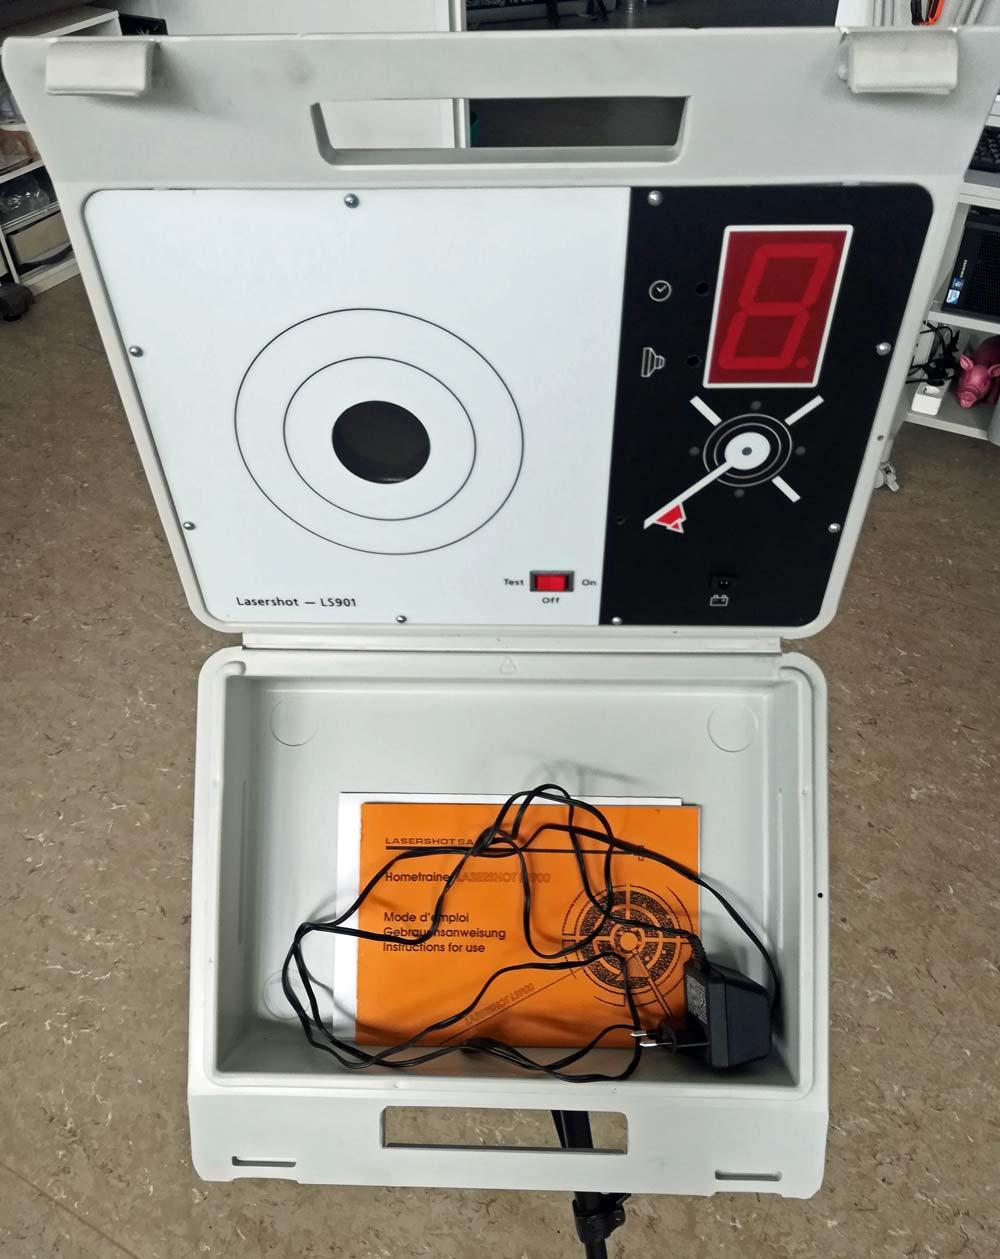 Lasershot LS 900